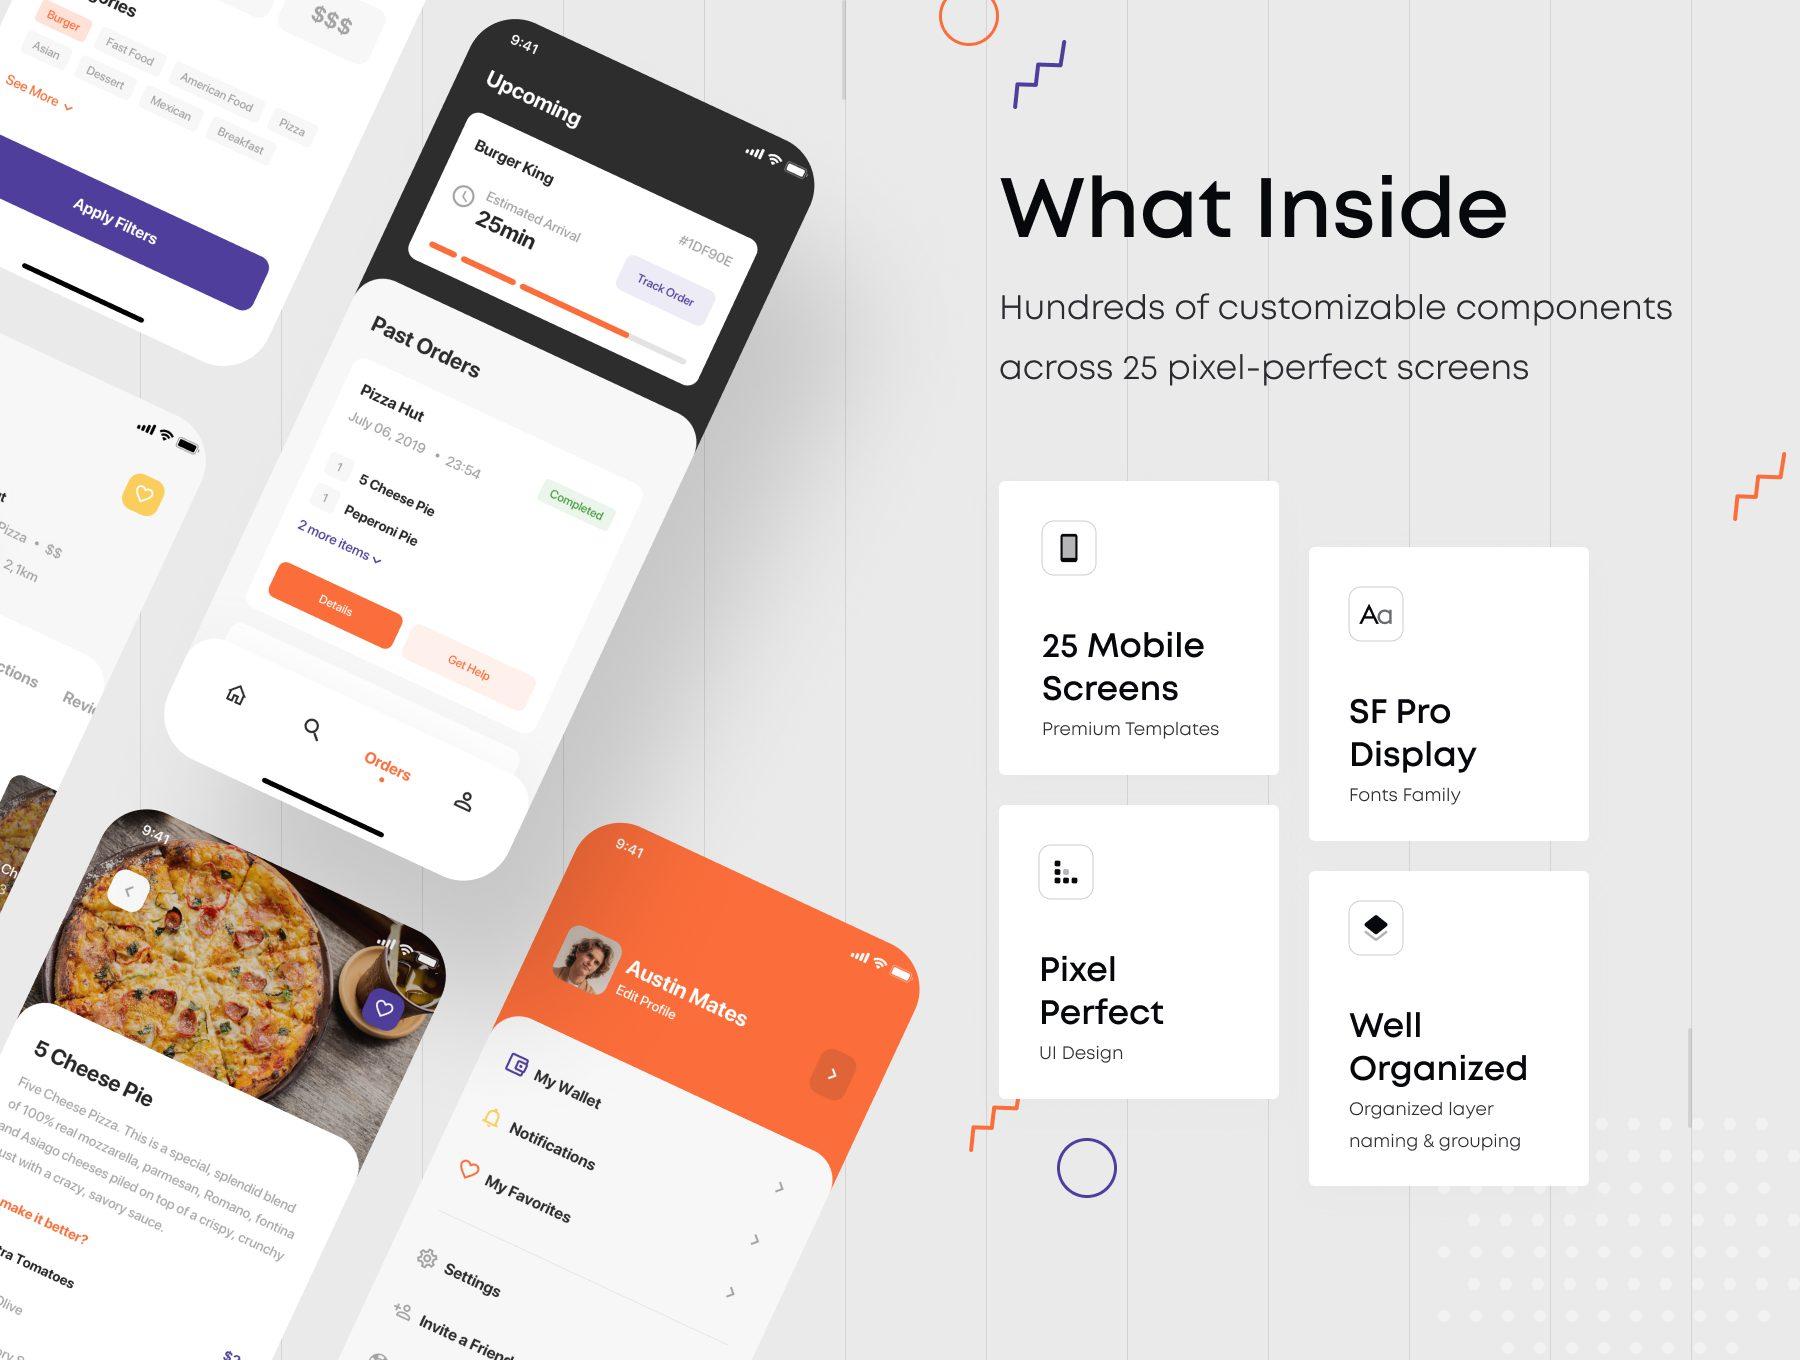 餐饮送餐服务类iOS APP UI KIT 界面设计模板下载[Sketch,fig] Nibble iOS UI Kit